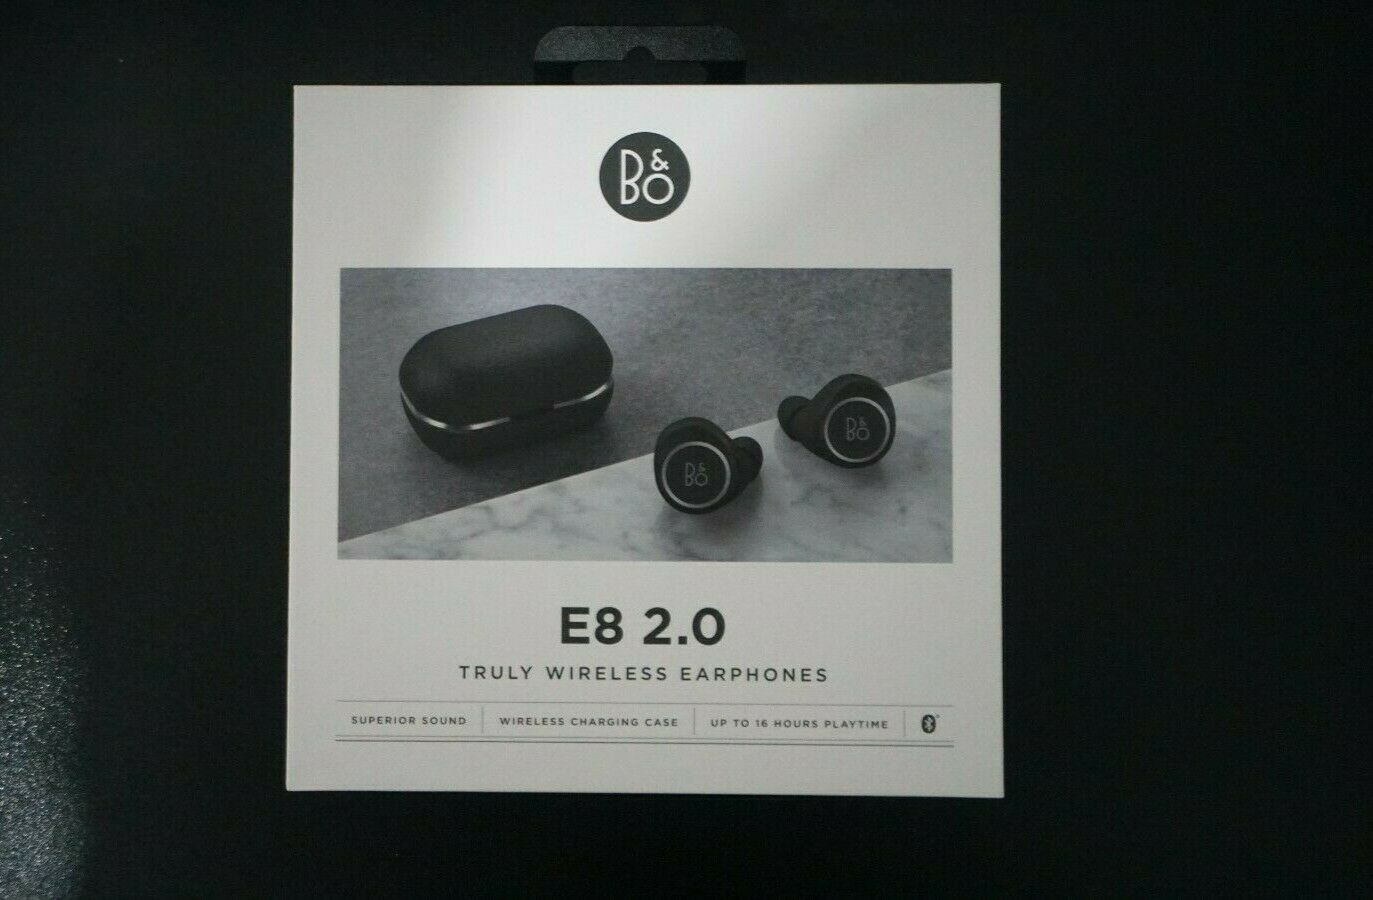 Bang and Olufsen Bluetooth Earphones E8 2.0